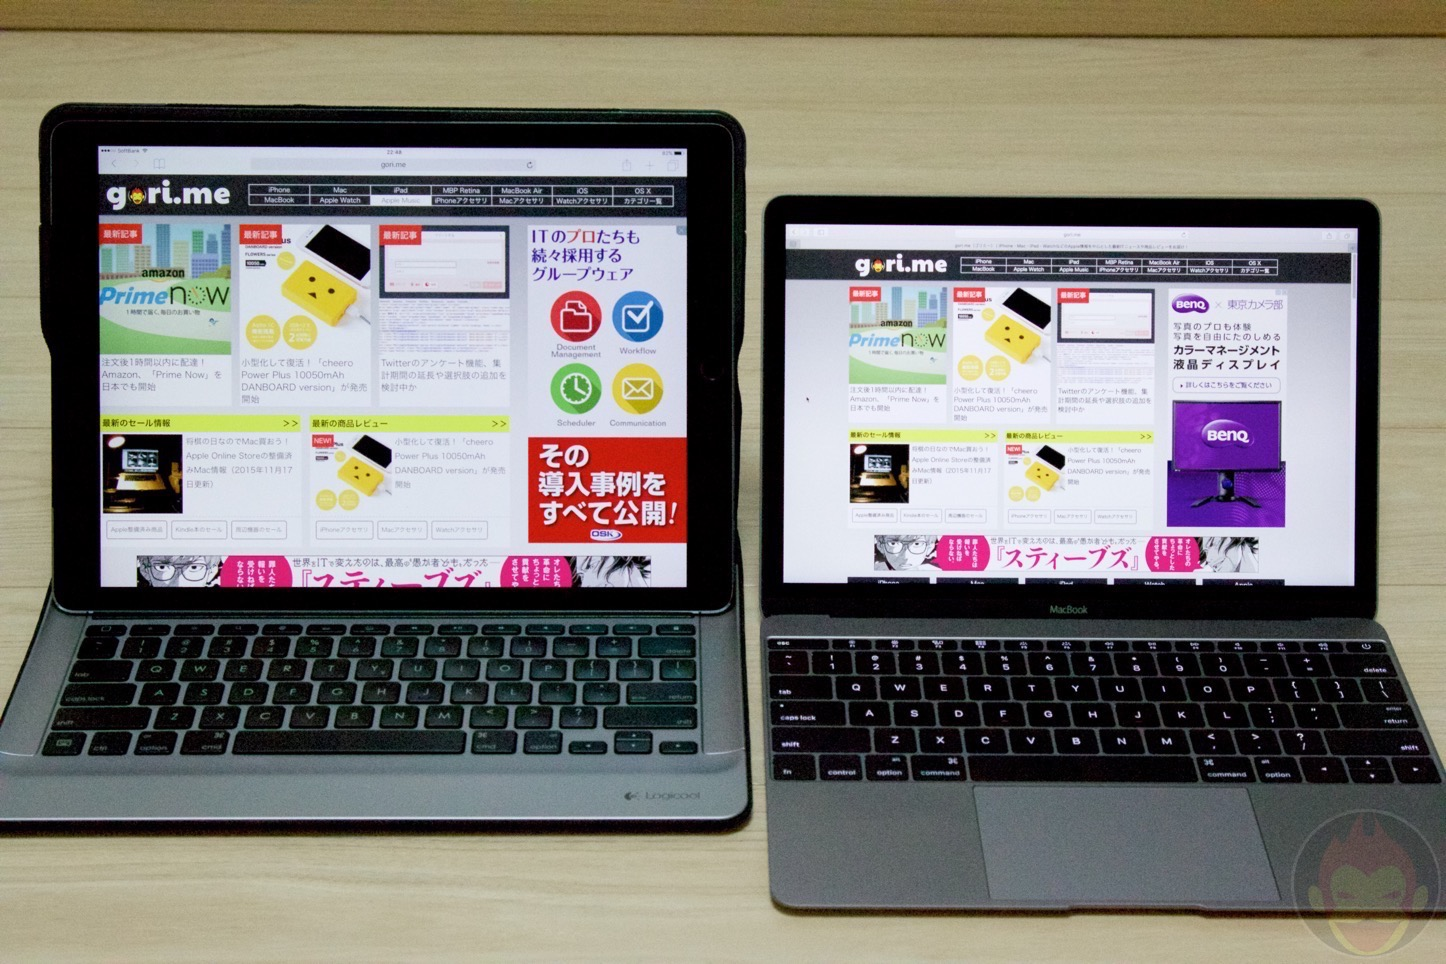 iPad-Pro-Review-MacBook-Comparison-12.jpg